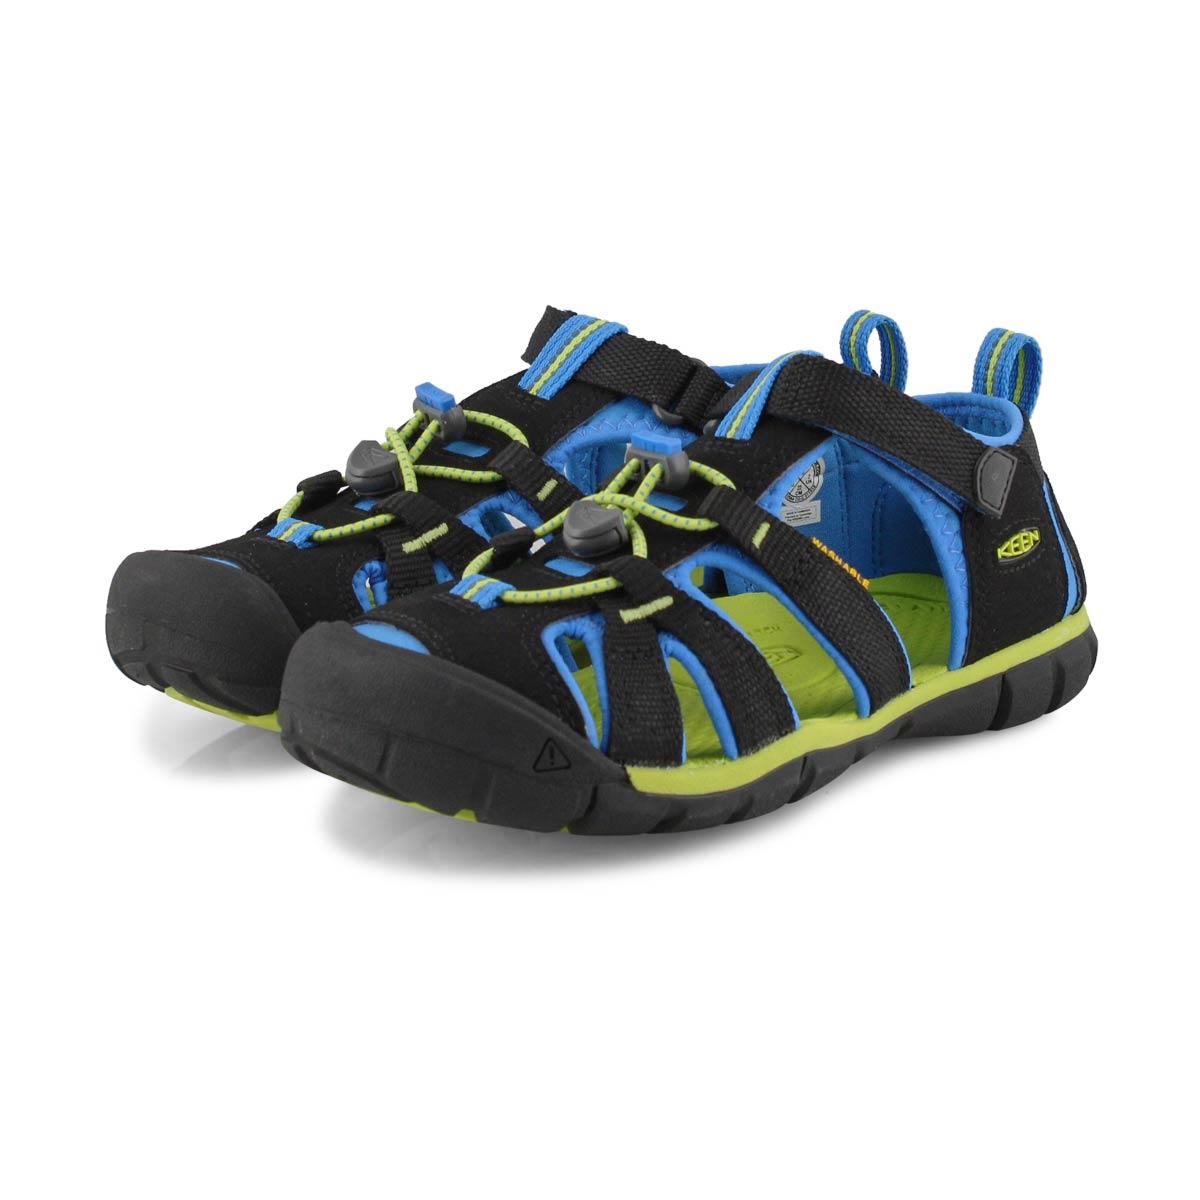 Boy's Seacamp II CNX Sport Sandal - Black/Blue